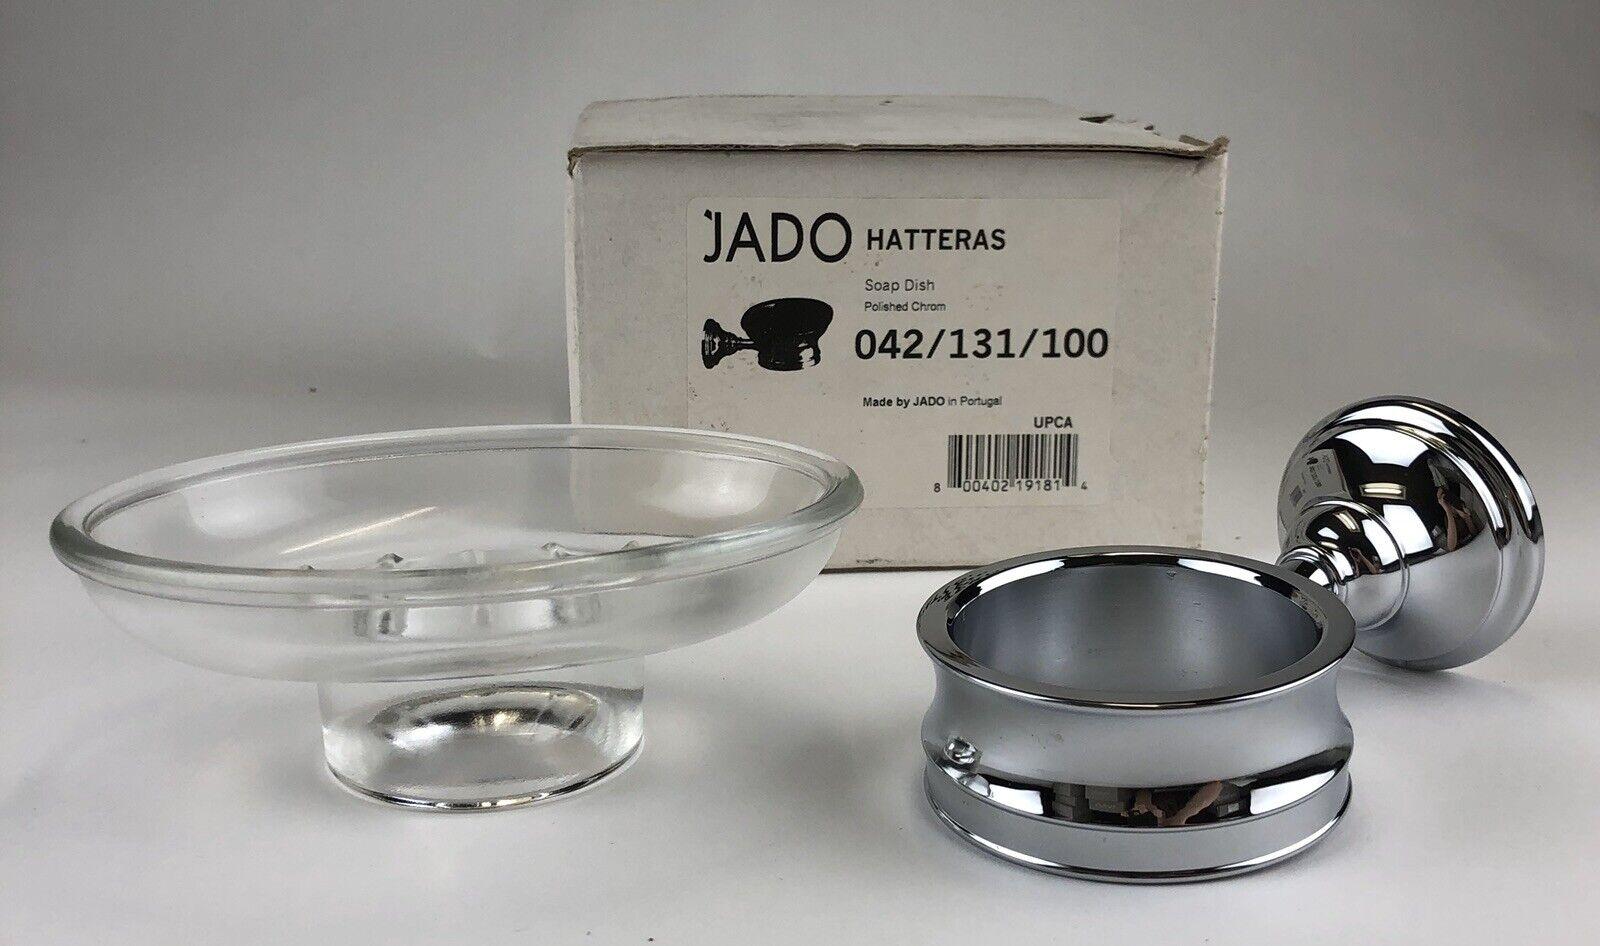 ~NIB~ JADO Soap Dish W/Holder - Hatteras Series - Polished Chrome - 042/131/100